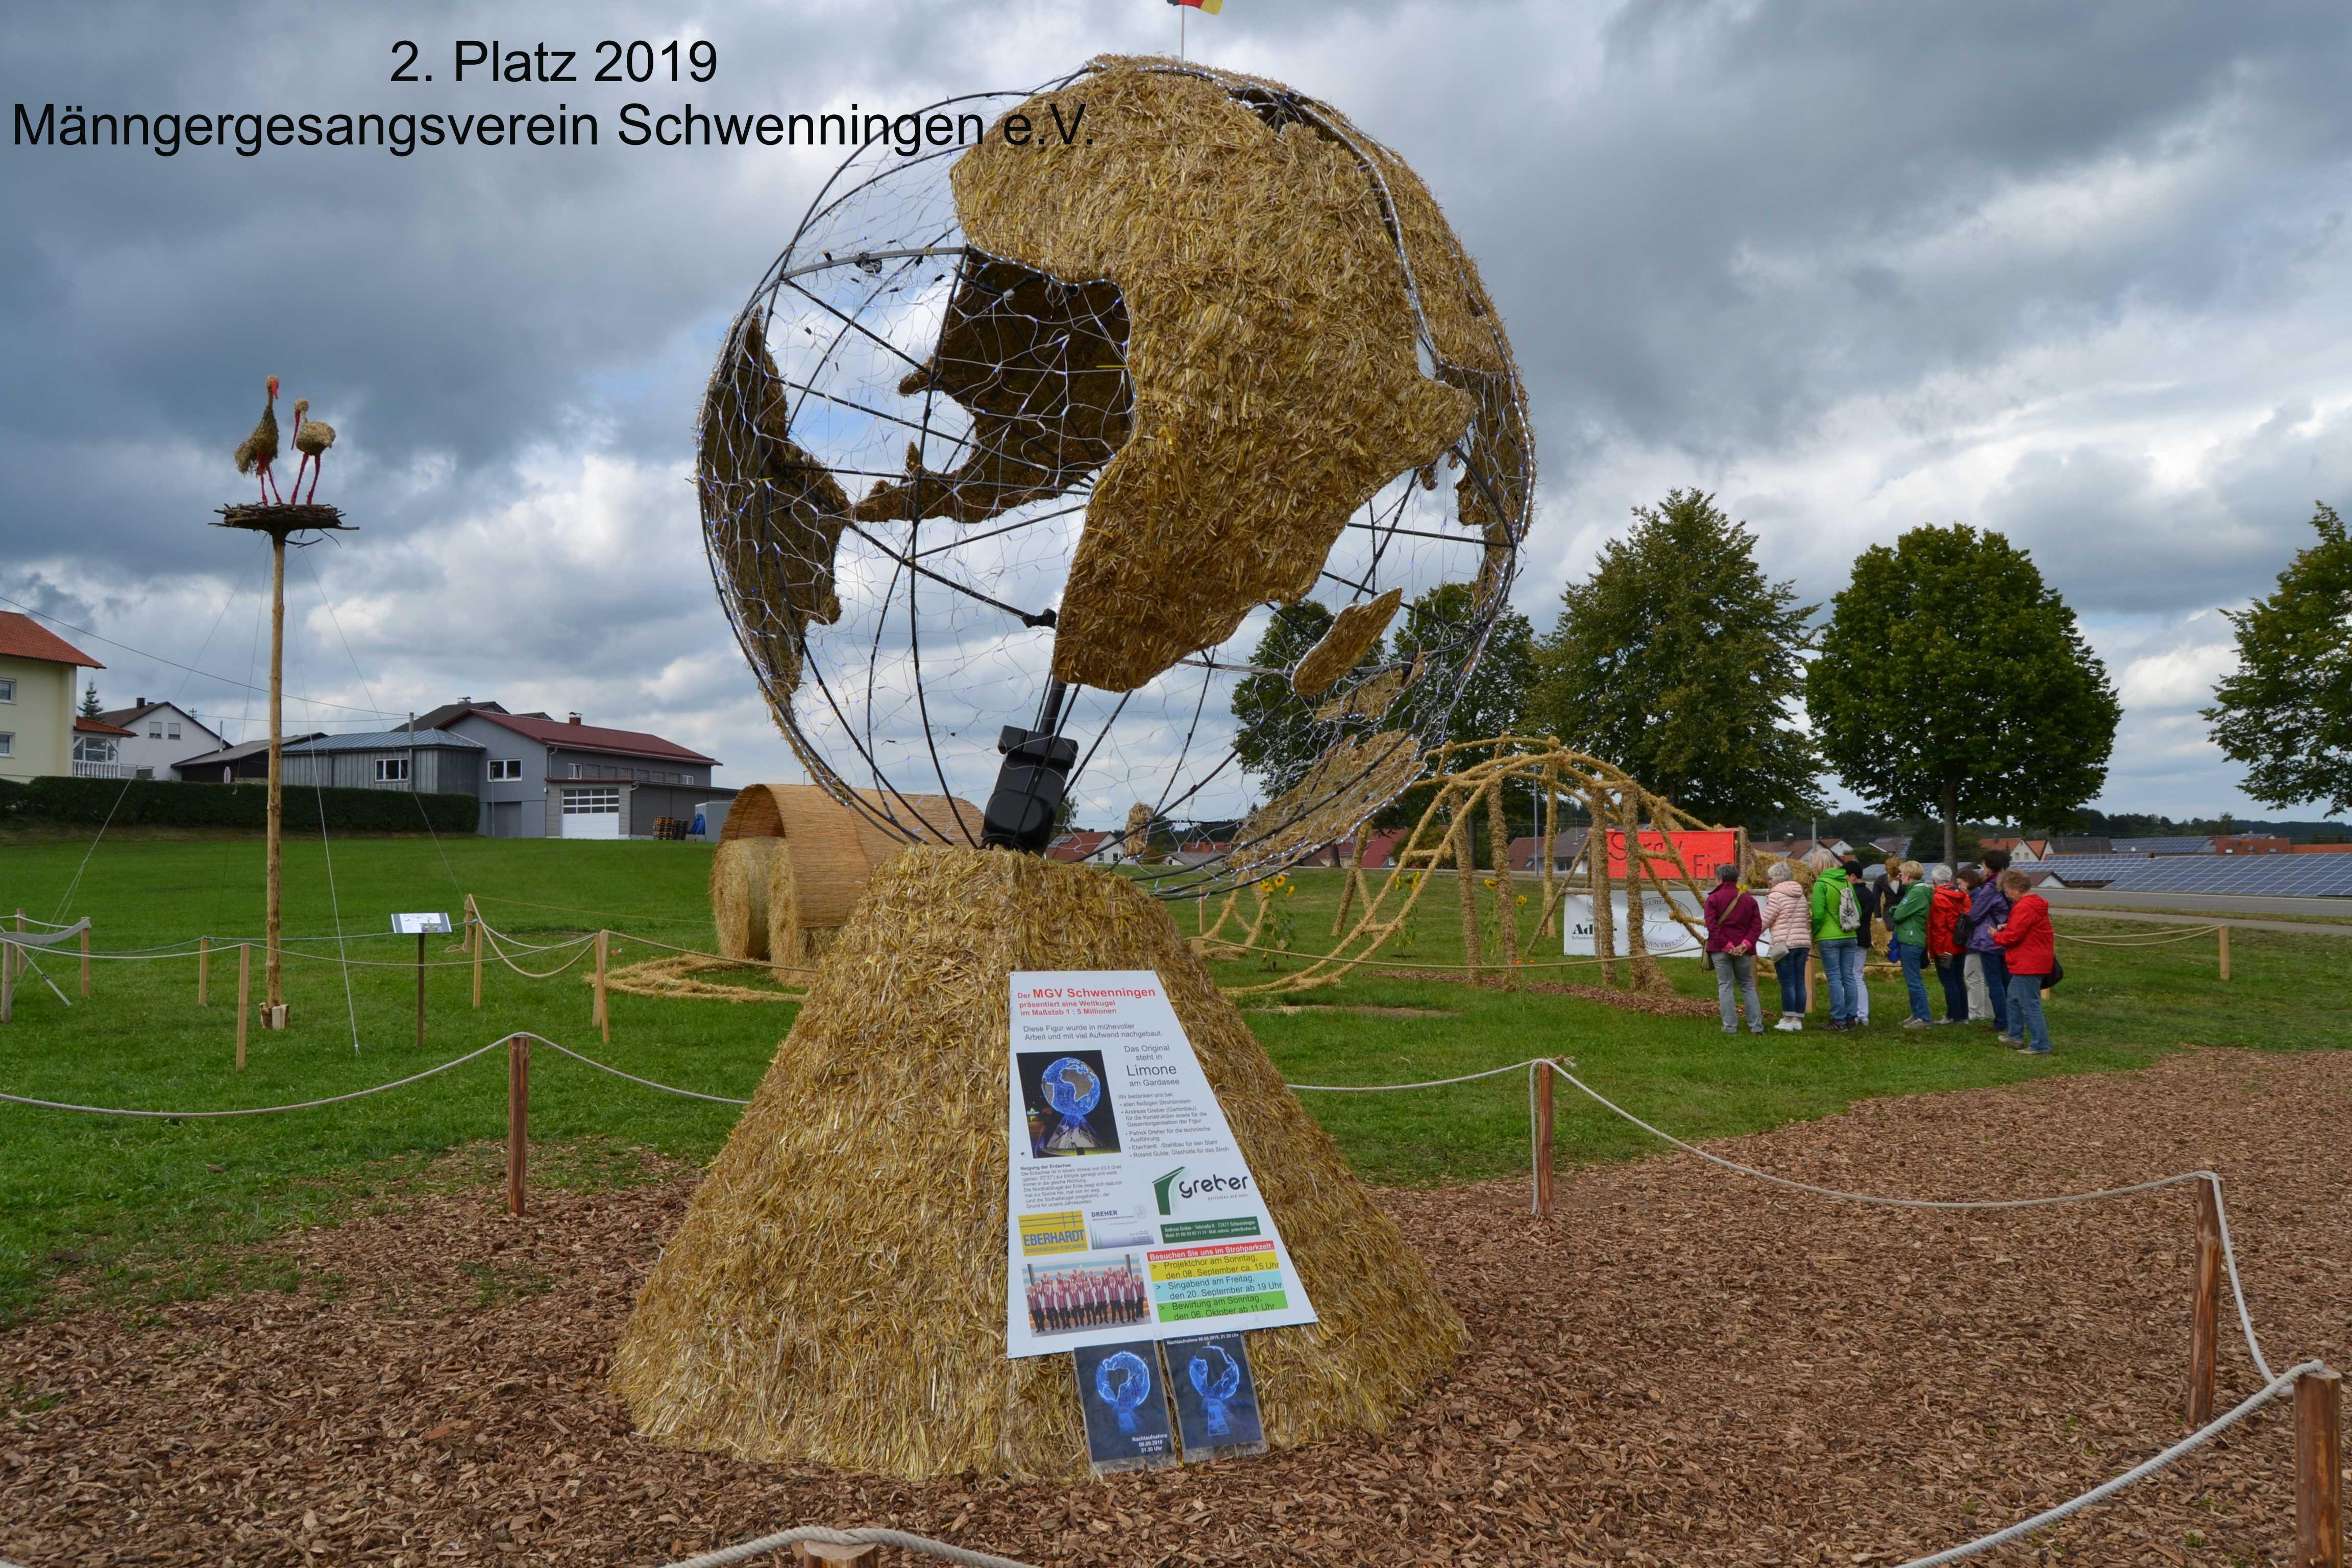 2_Platz_2019_MGV_Schwenningen.jpg